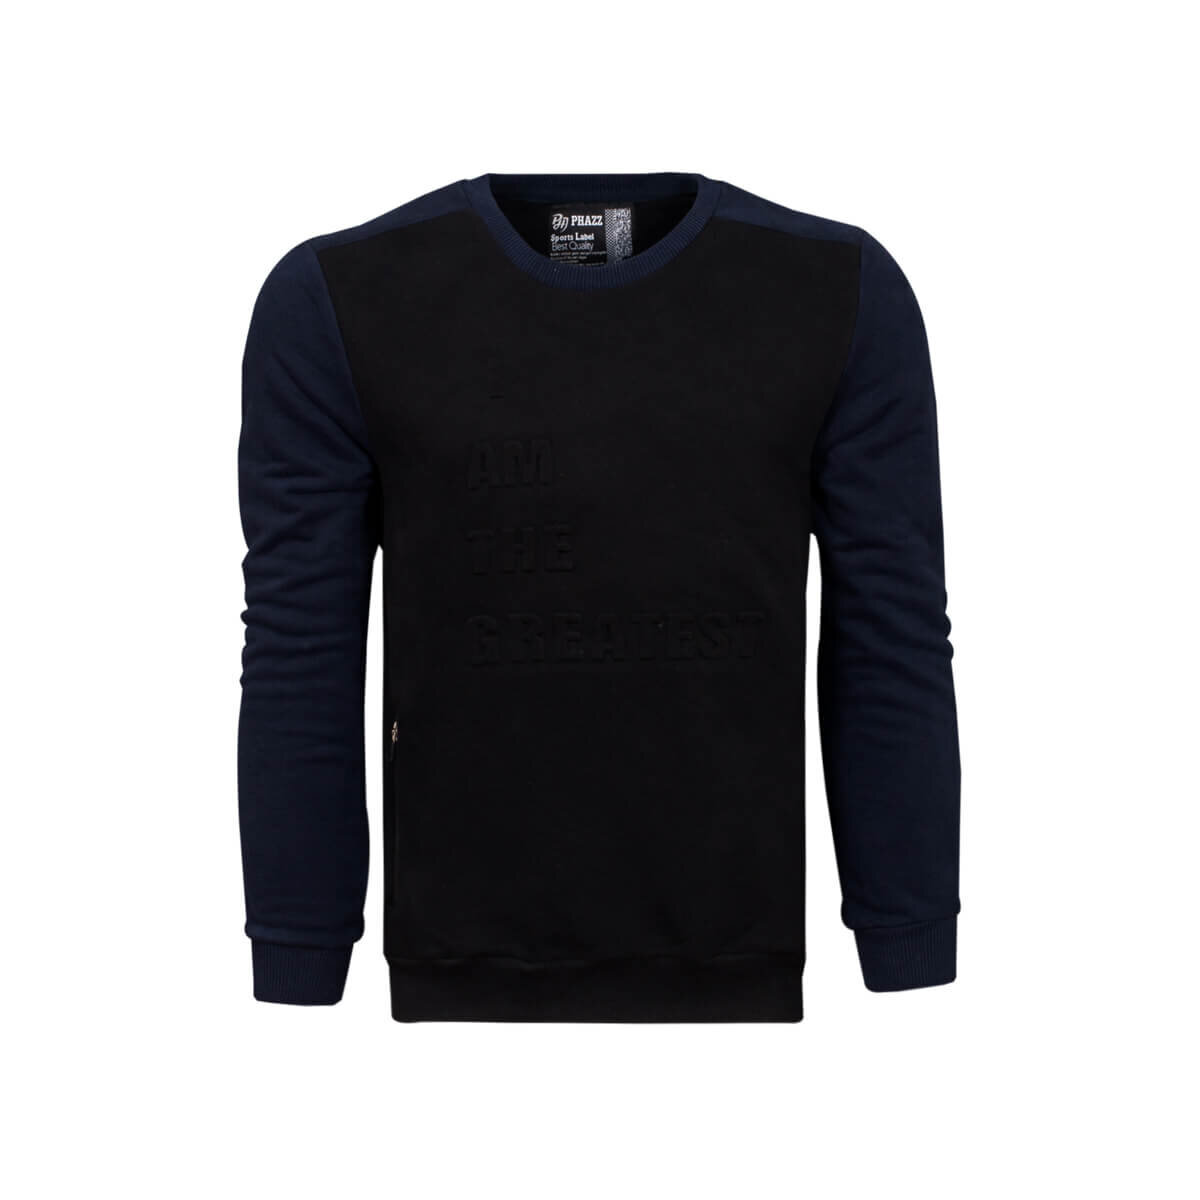 SIYAH Erkek Sweatshirt 85312 SW